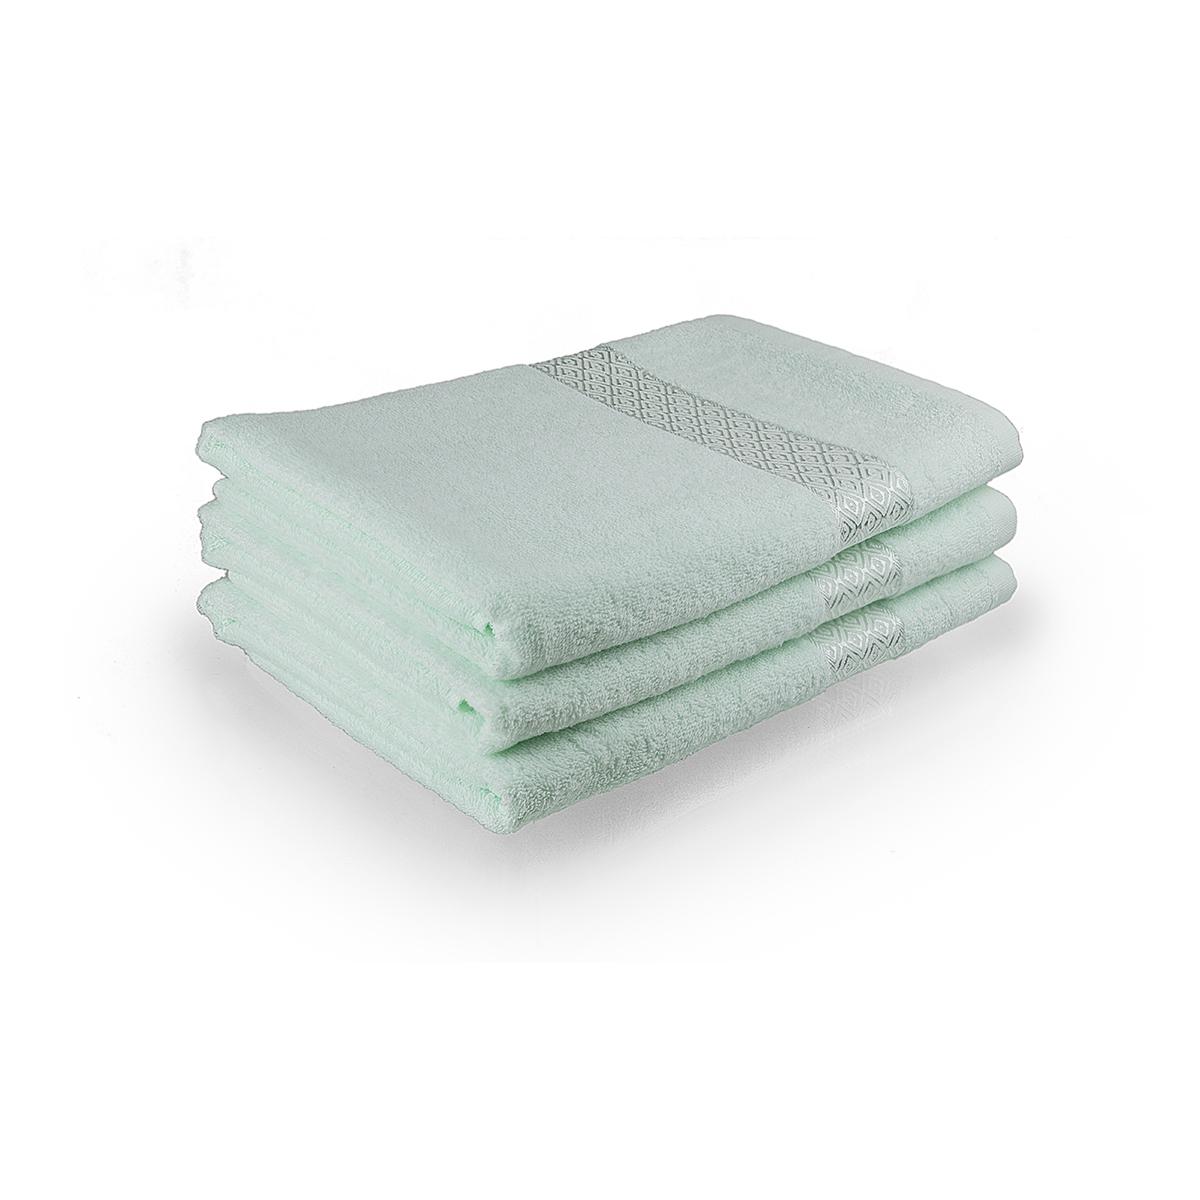 Полотенце Серебро Зеленый, размер 70х140 смМахровые полотенца<br>Плотность ткани:360 г/кв. м.<br><br>Тип: Полотенце<br>Размер: 70х140<br>Материал: Махра